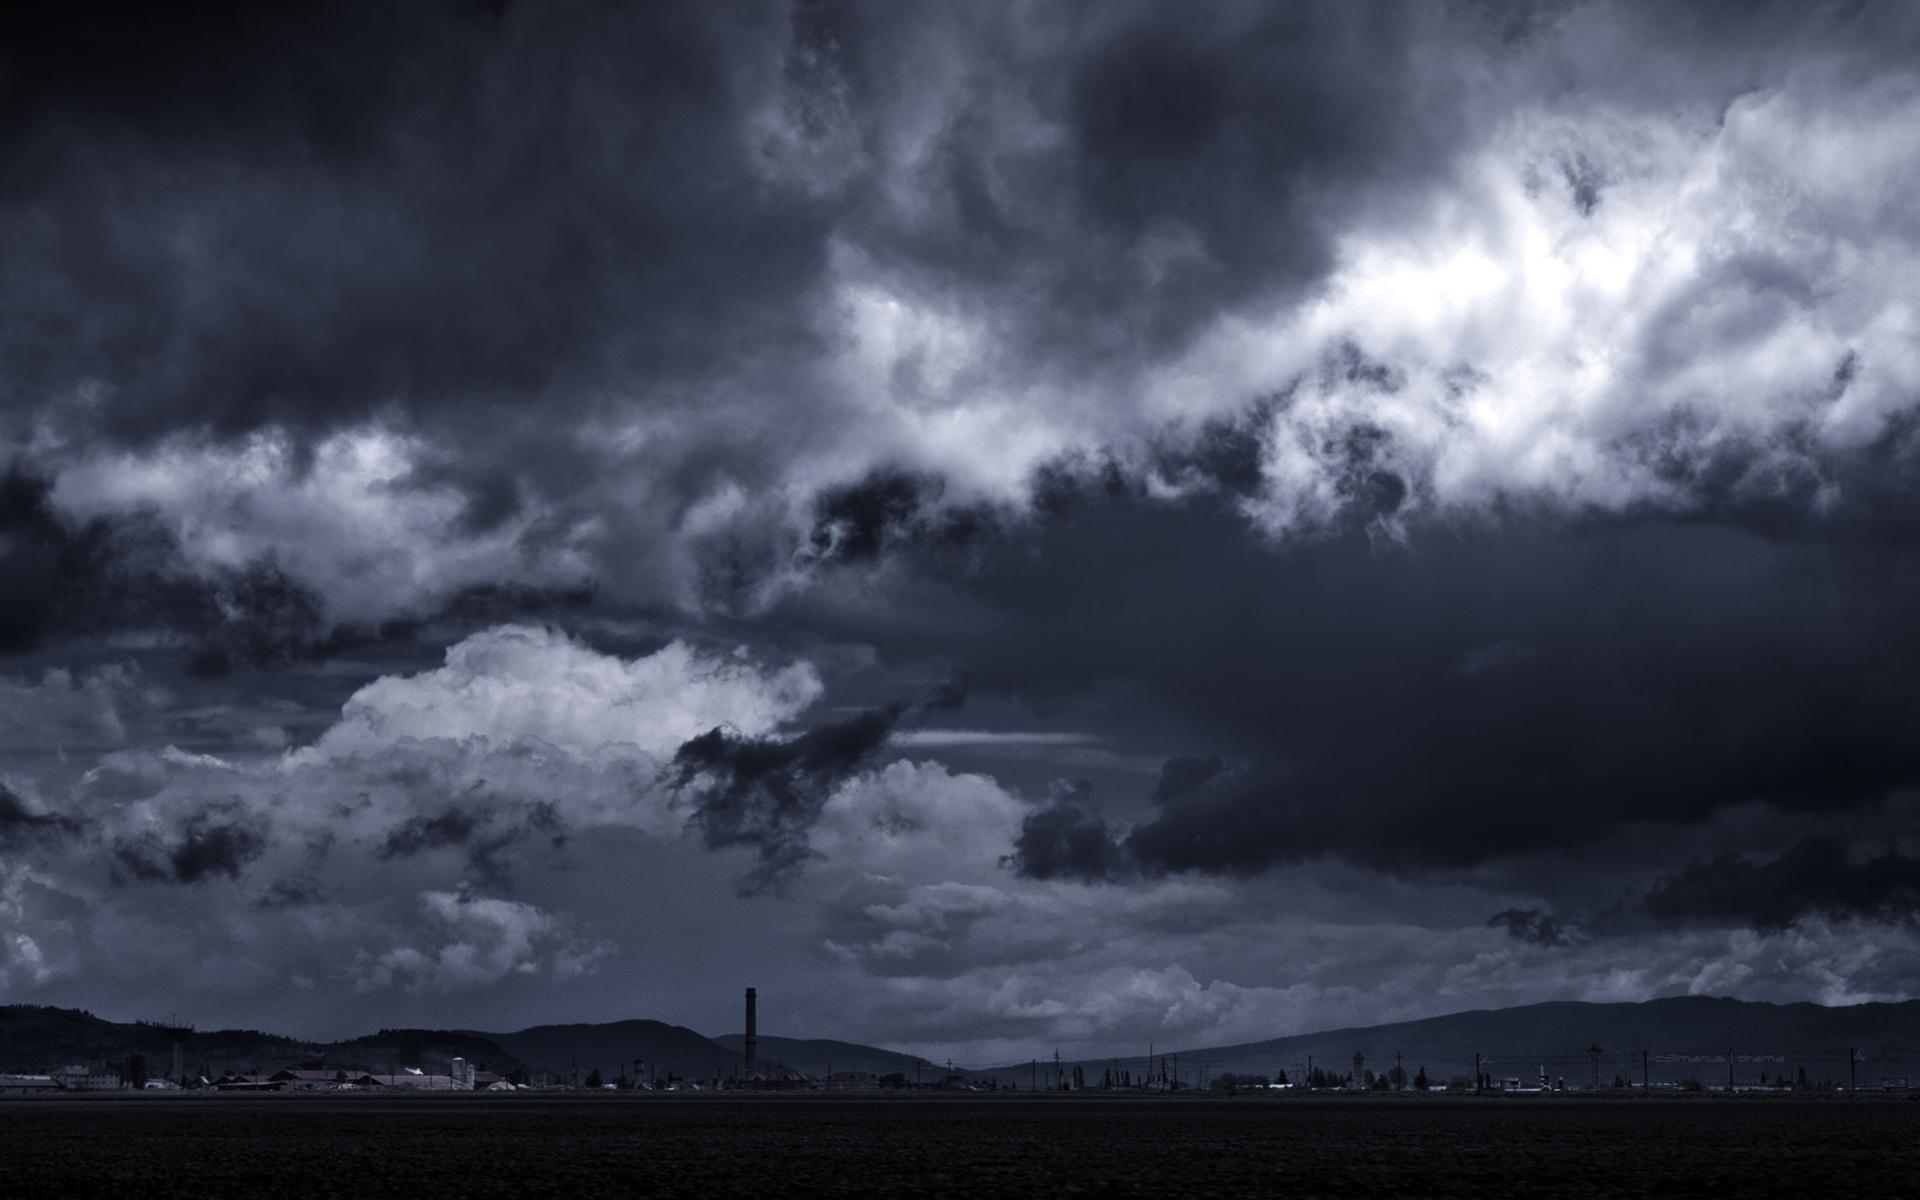 Storm Clouds wallpaper 1920x1200 7950 1920x1200